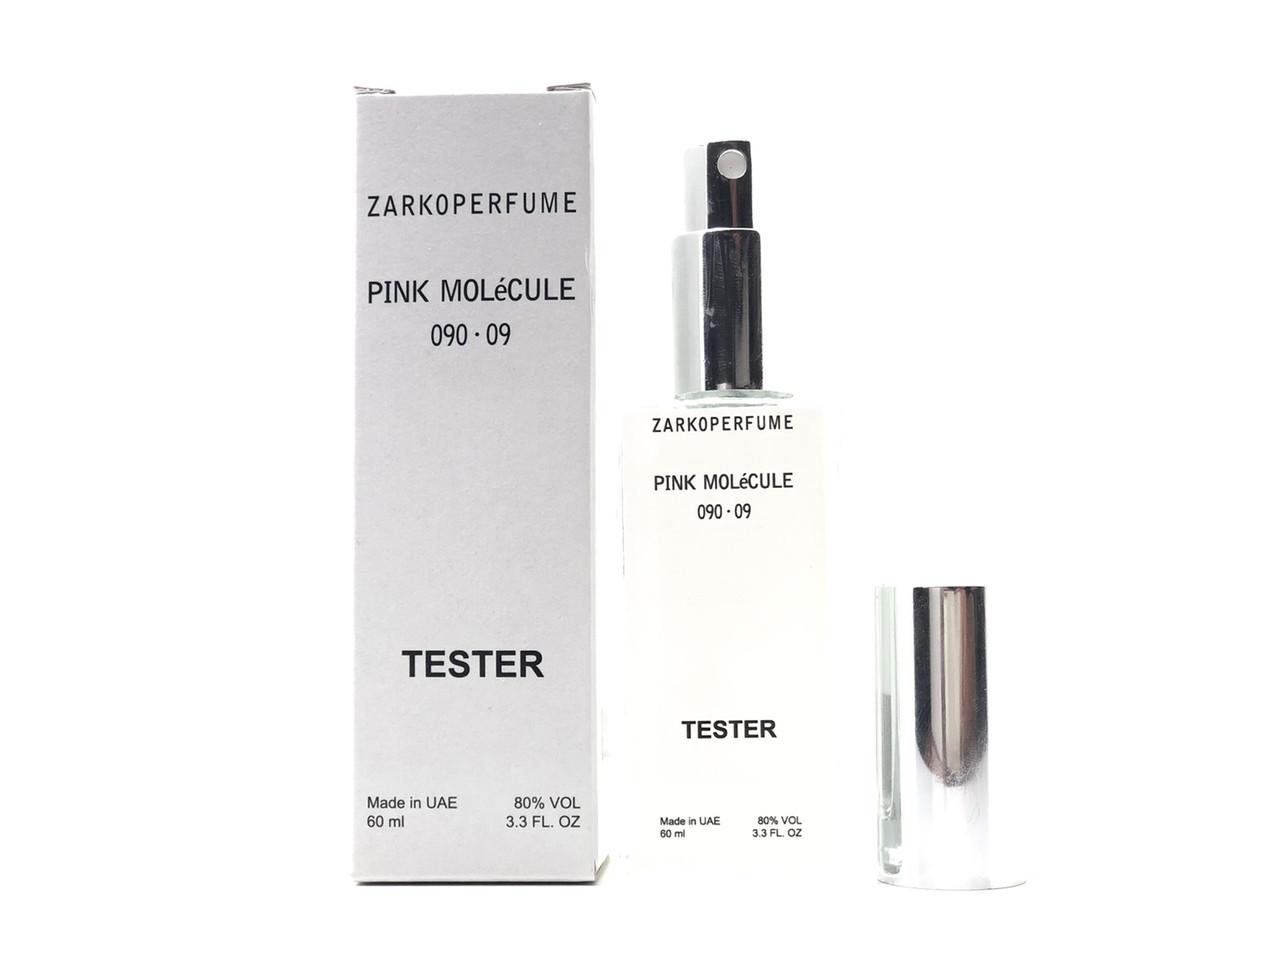 Тестер унисекс Zaeko Perfume Pink Molecules 090-09 (Зарко Парфюм Пинк Молекула 09) 60 мл